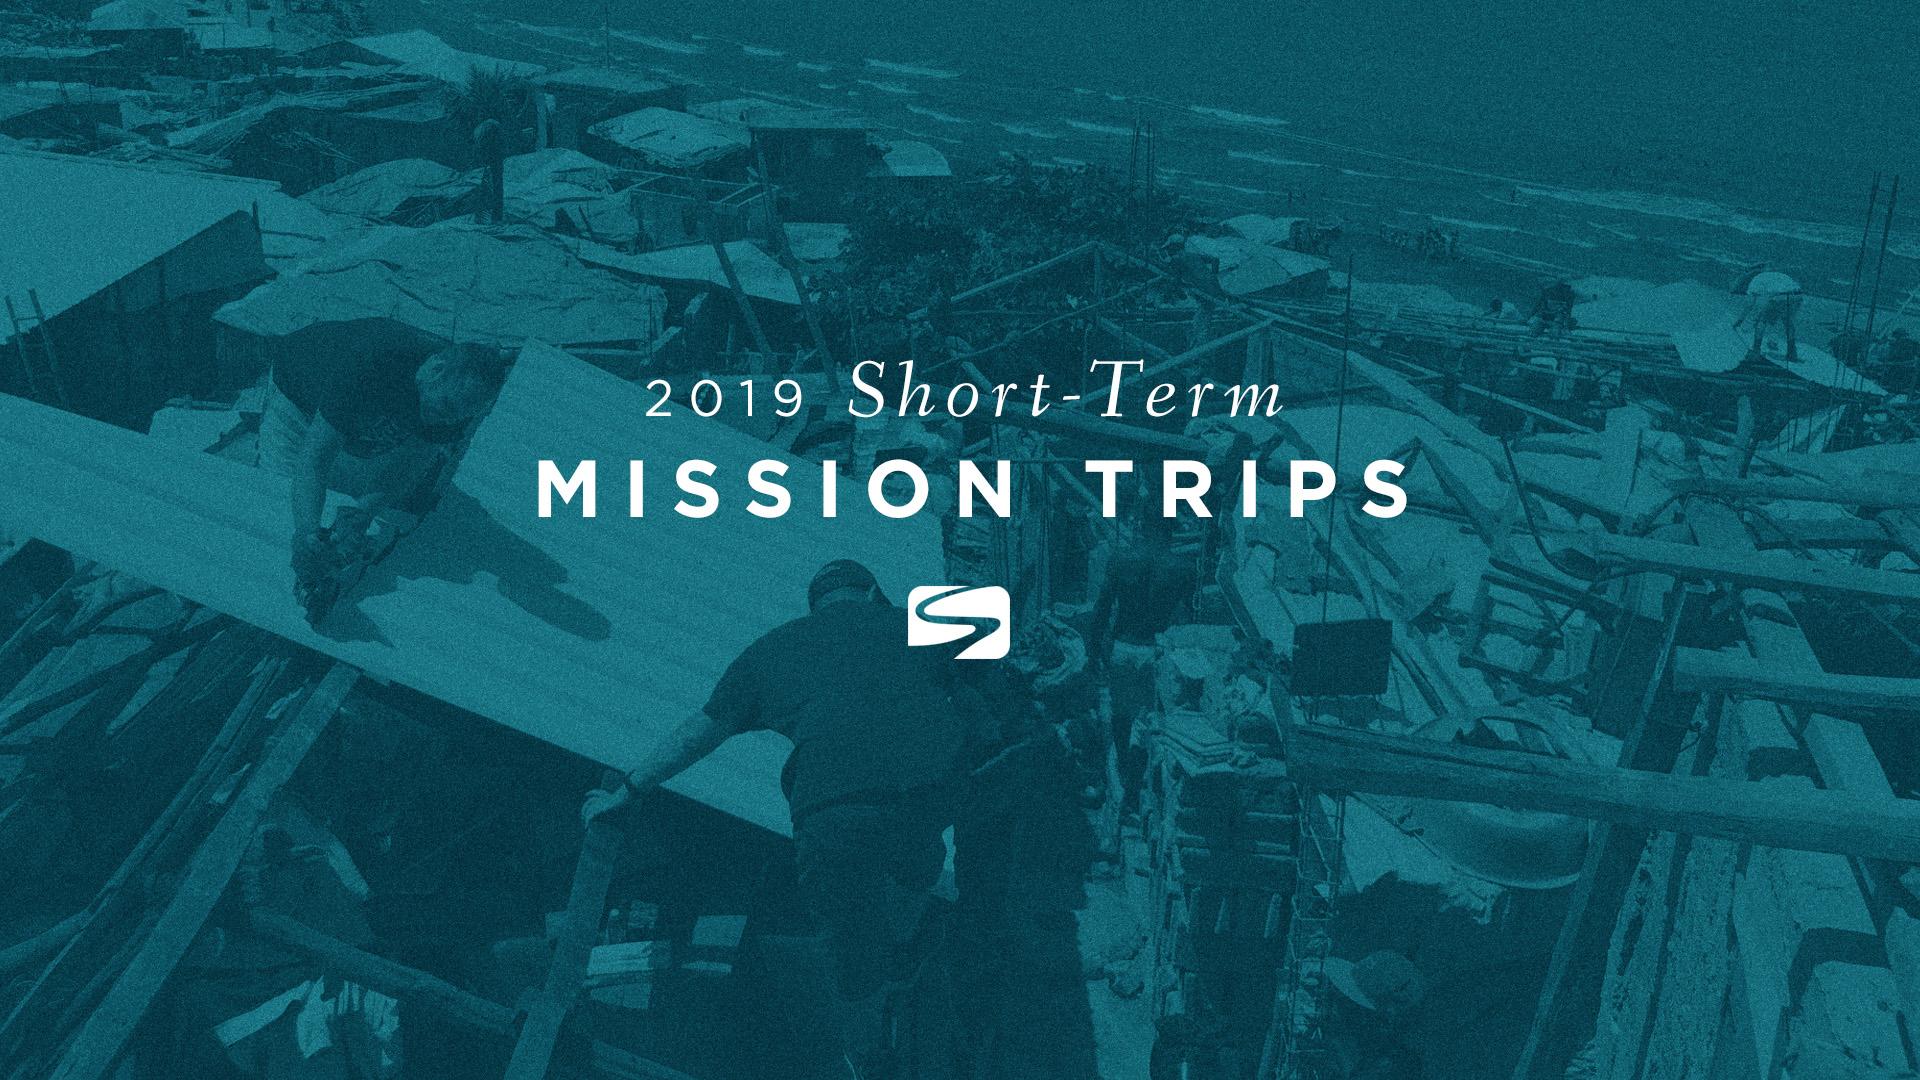 MissionTrips_2019_blog_email_socialmedia.jpg